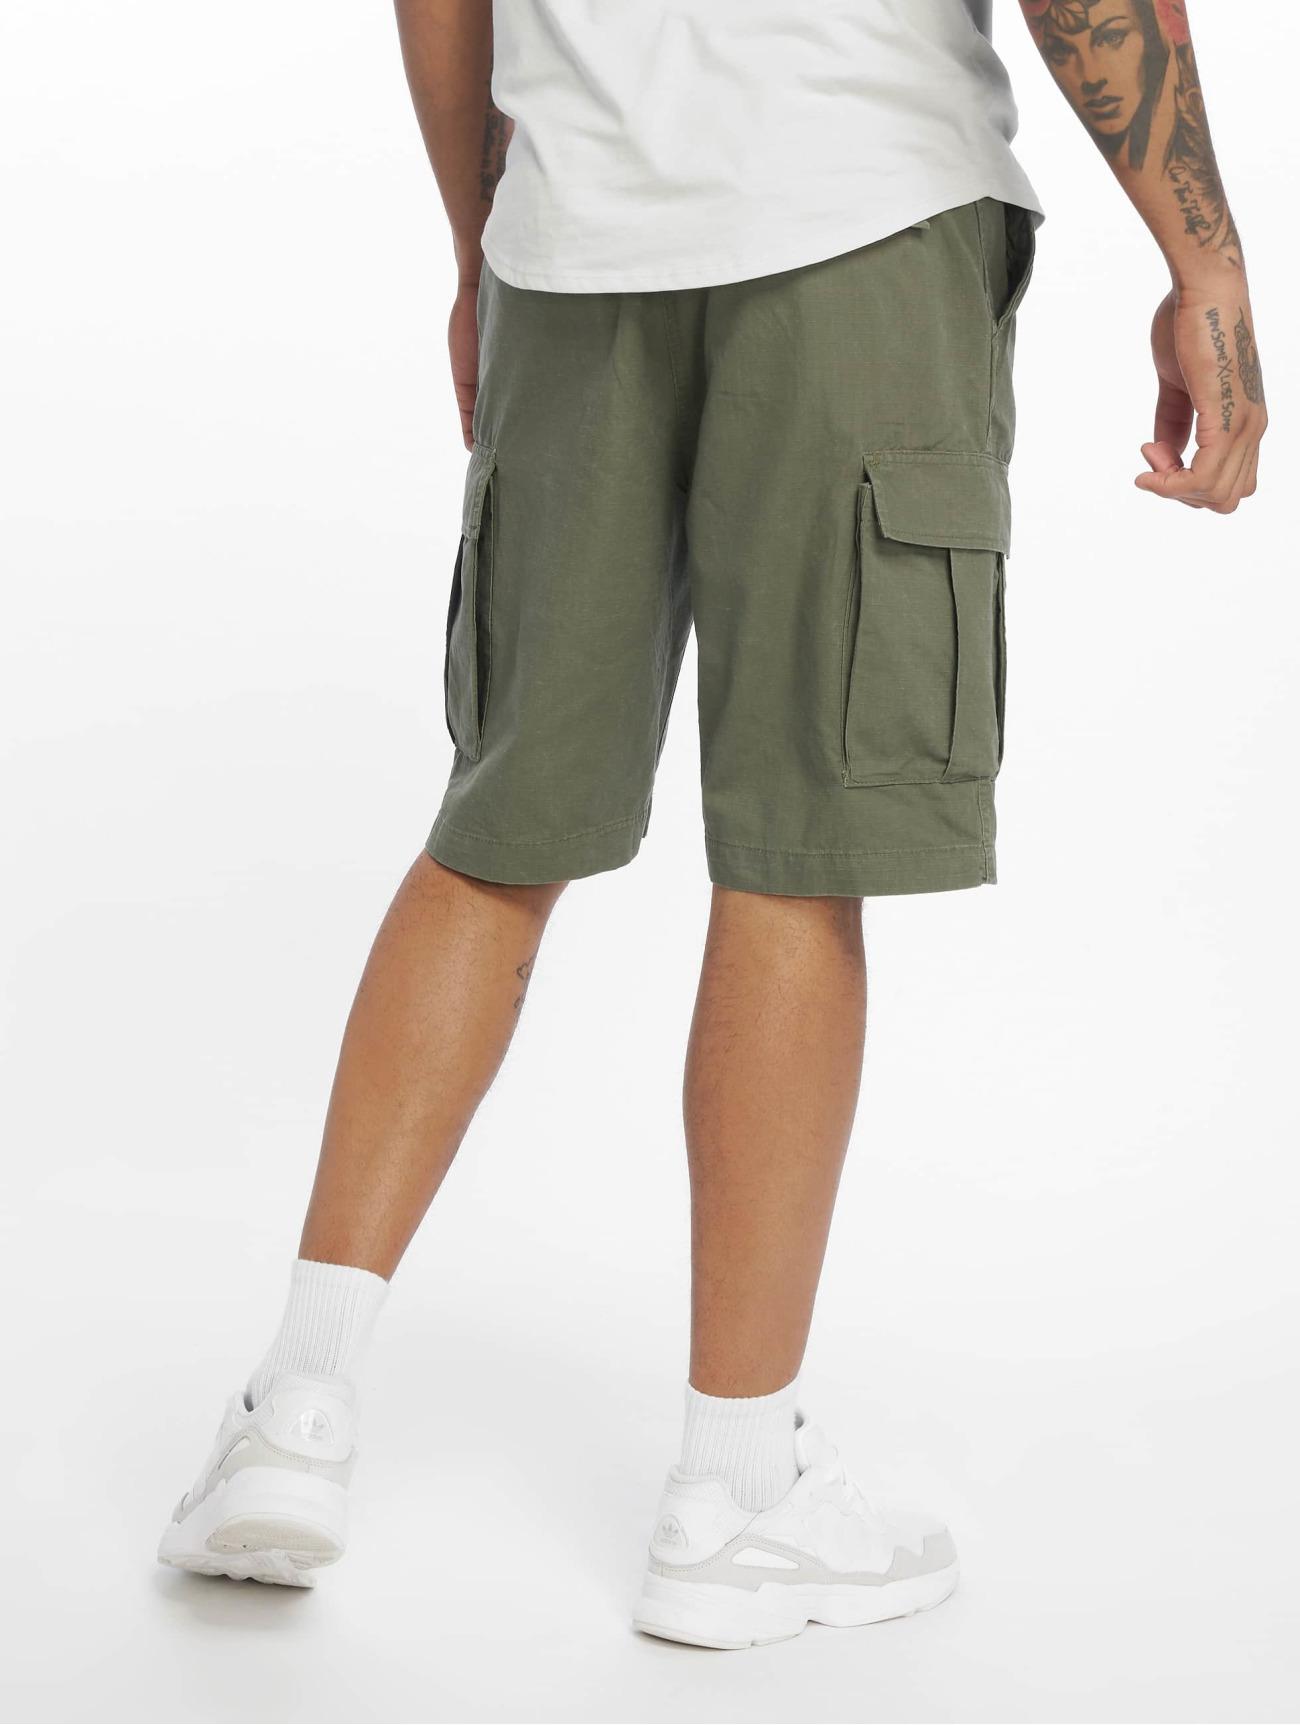 Brandit  BDU Ripstop  olive Homme Short  674210 Homme Pantalons & Shorts